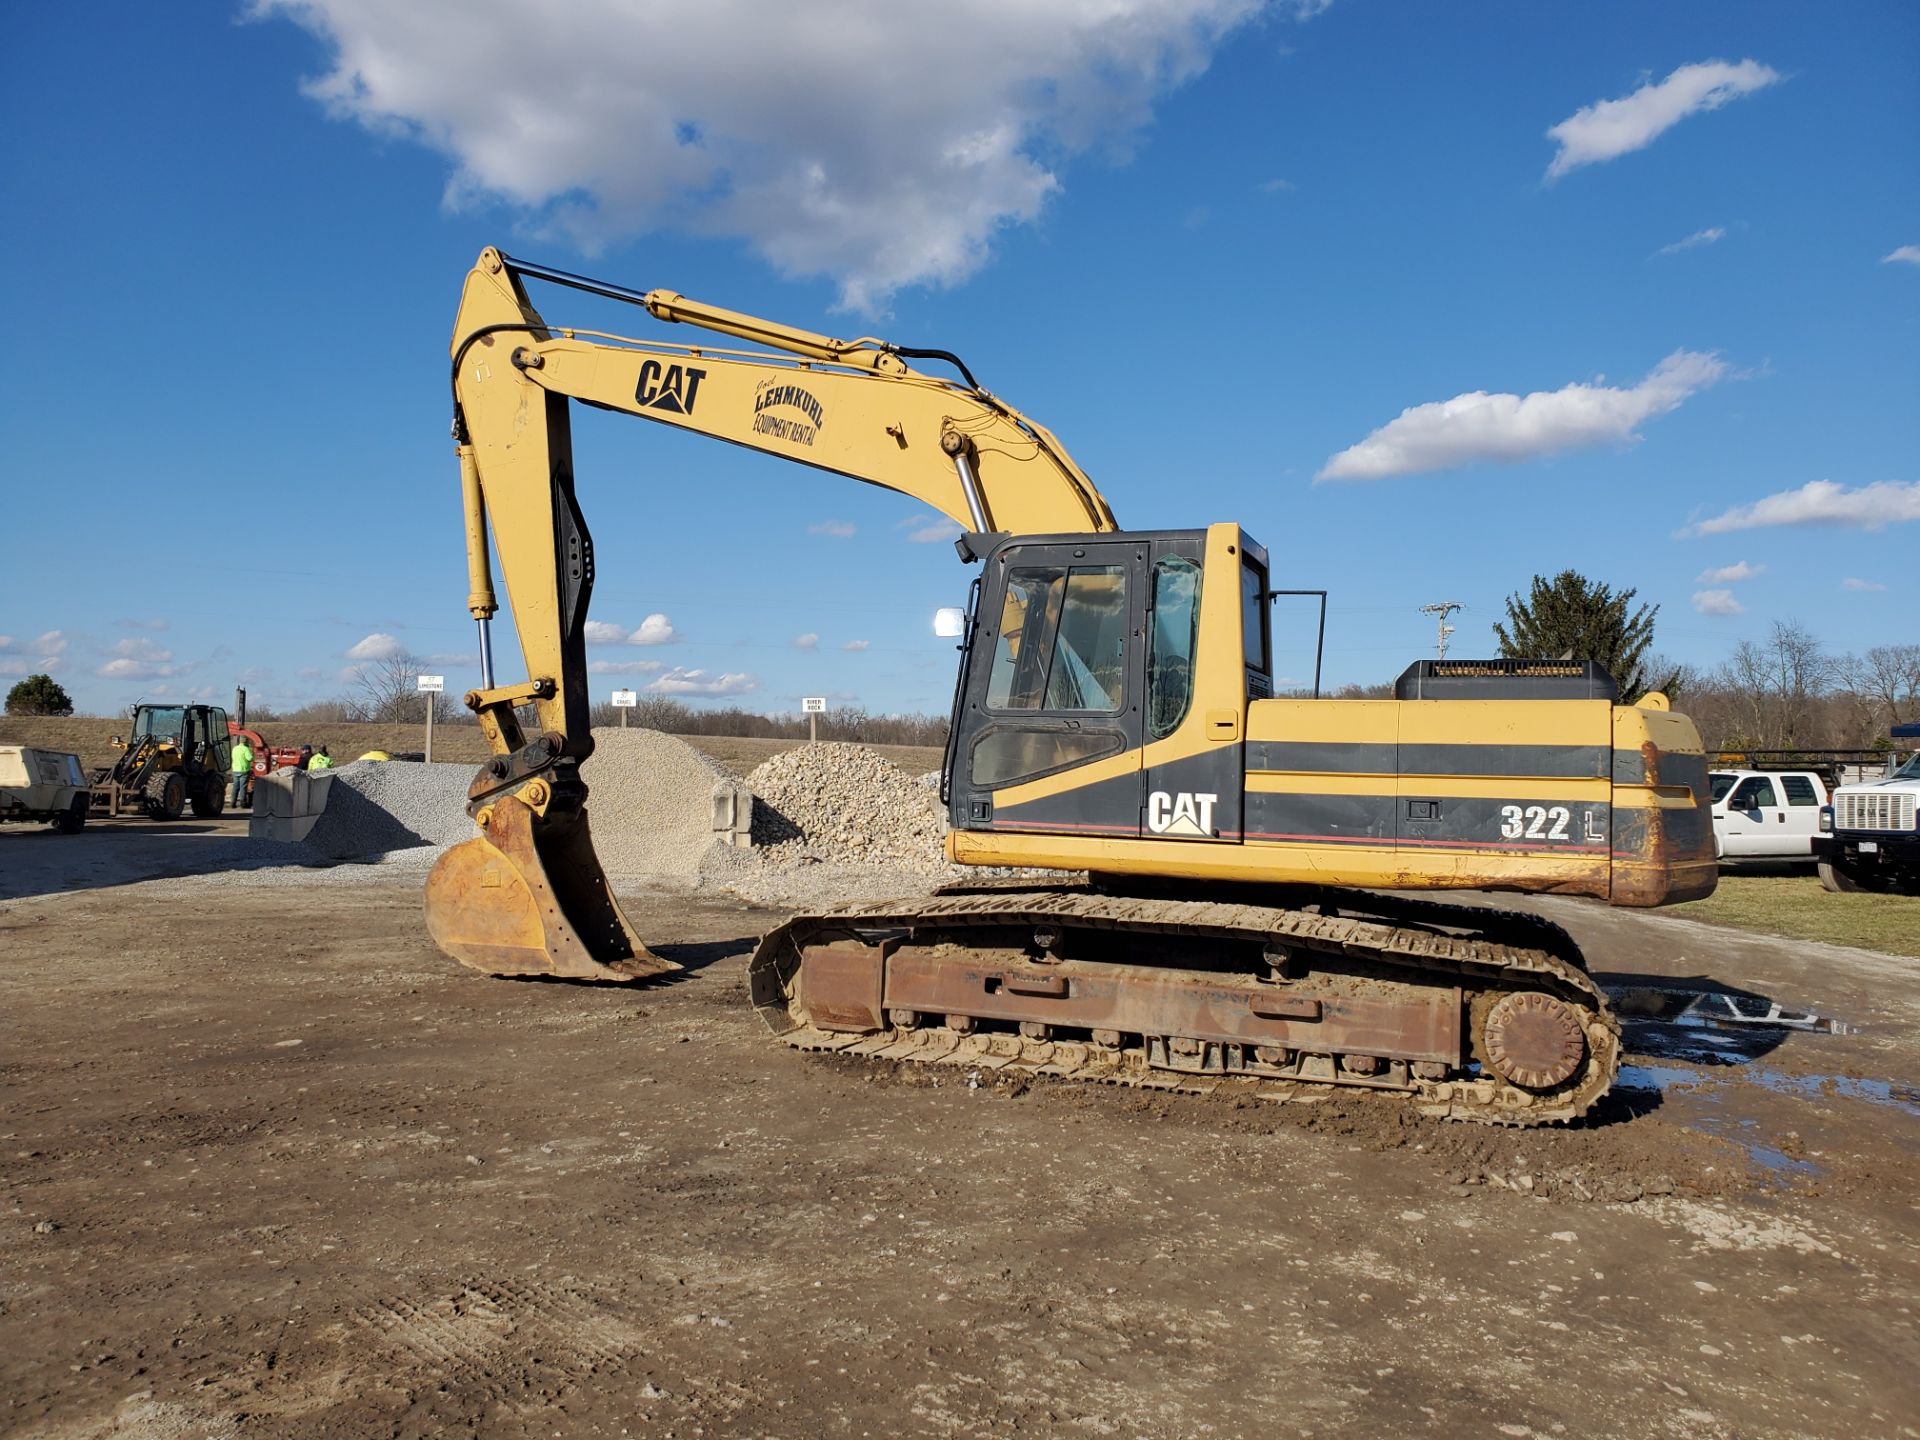 1996 Caterpillar 322L Hydraulic Excavator, Enclosed Cab, 28 in Bucket, Cat 3116 Engine, 9579 Hours - Image 2 of 18